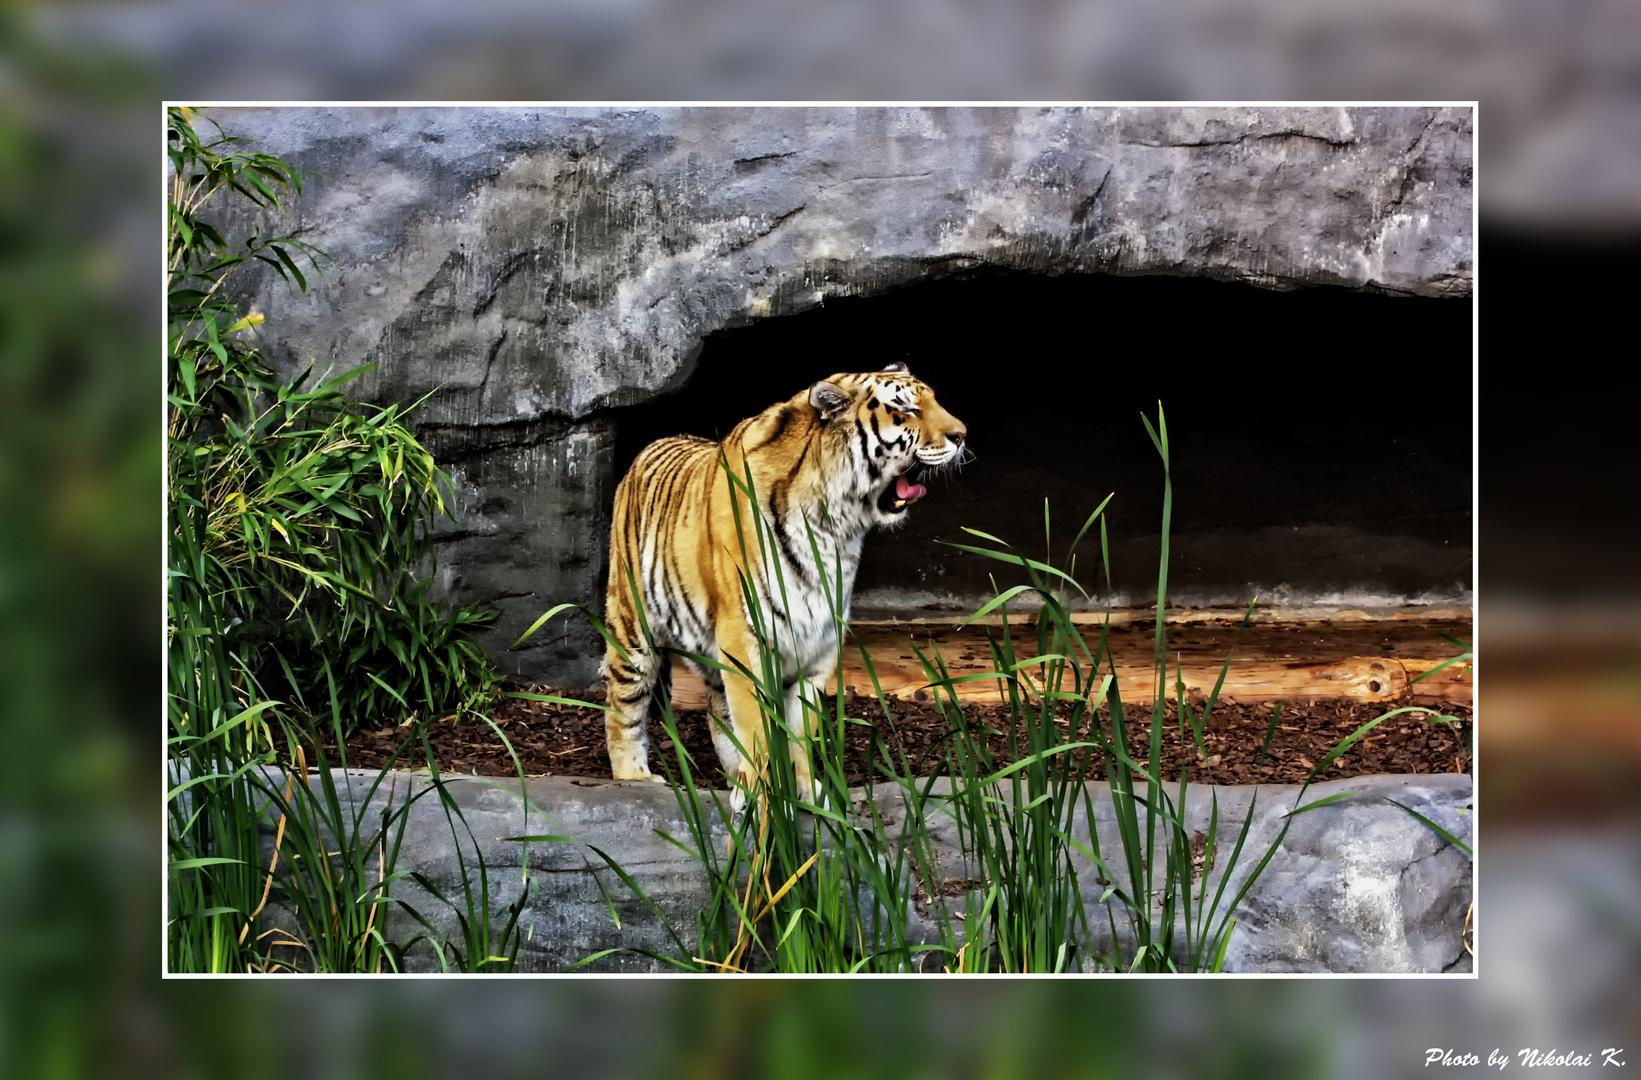 Tiger aus dem Hamburger Zoo